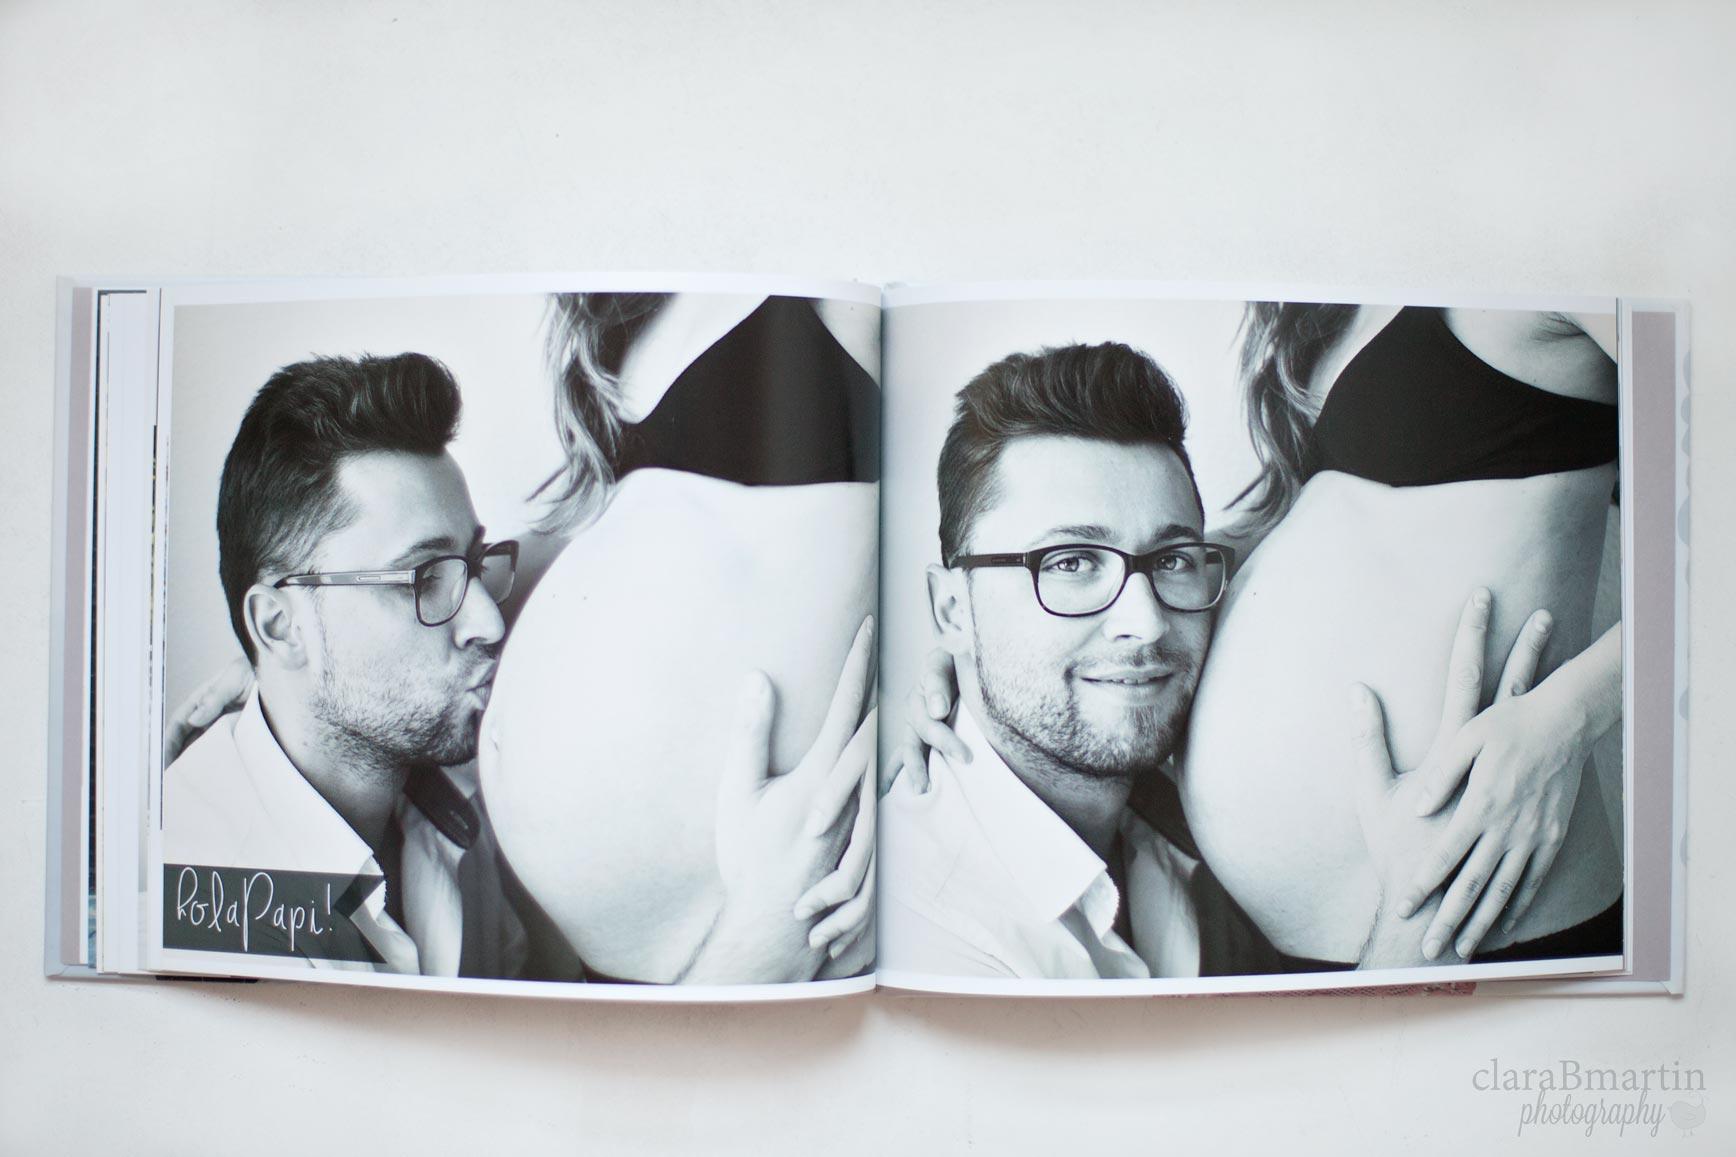 Libro-de- embarazo-Blurb-clarabmartin